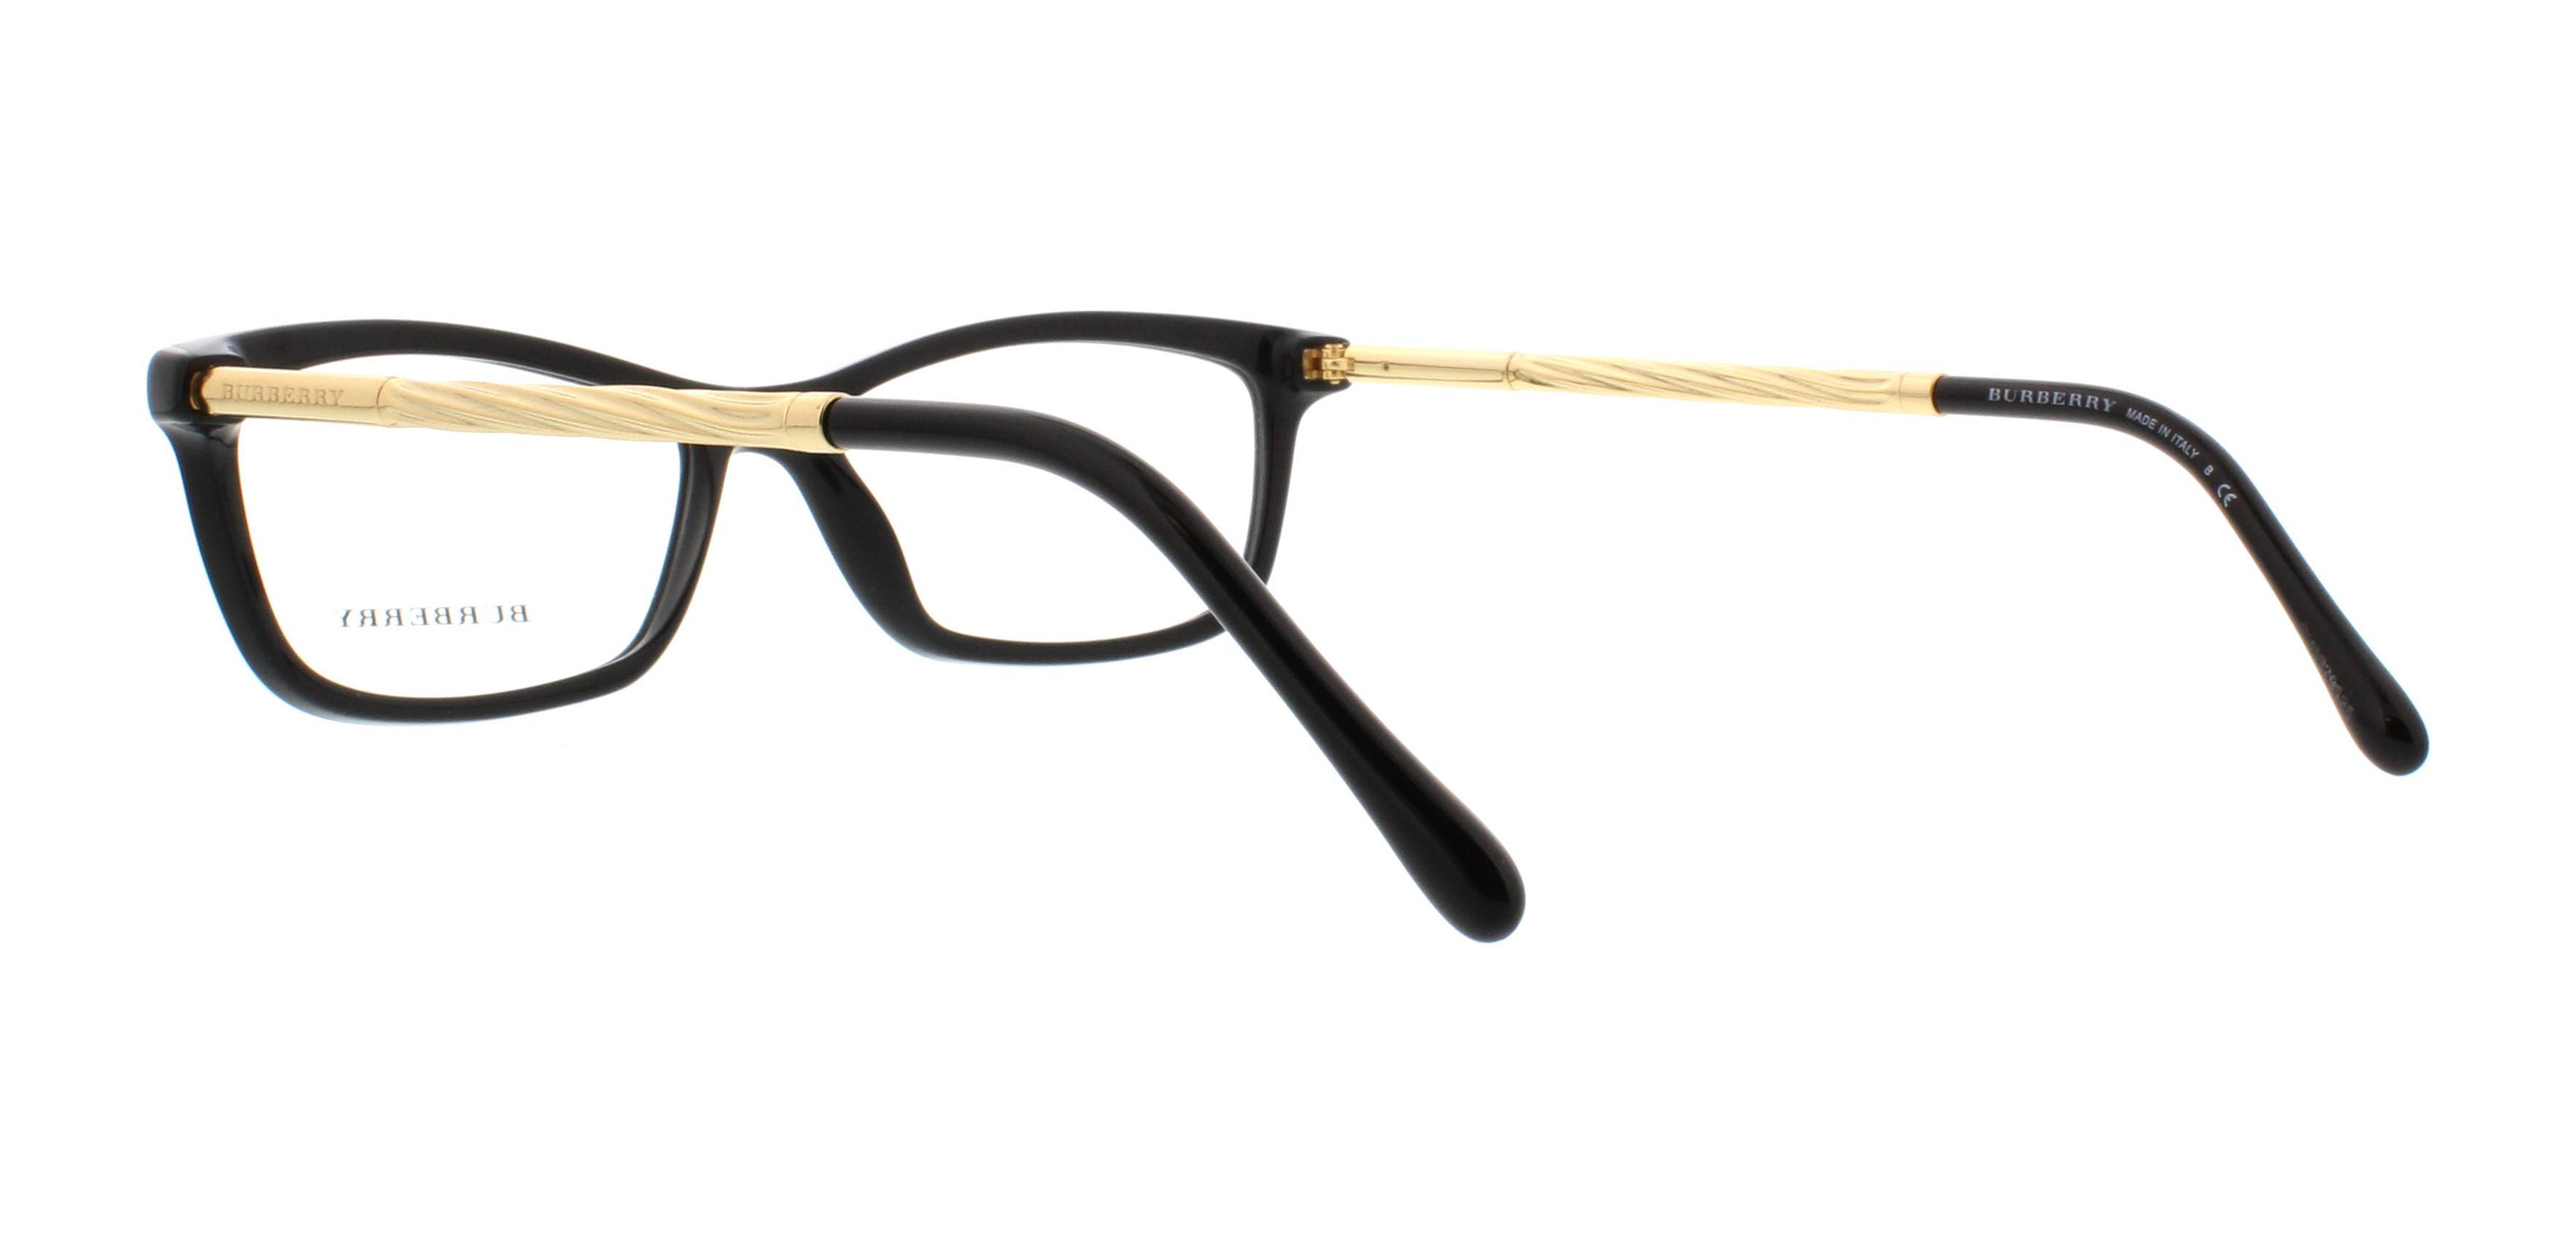 63b65ae52a77 Designer frames outlet burberry jpg 3524x1716 Burberry eyeglasses women